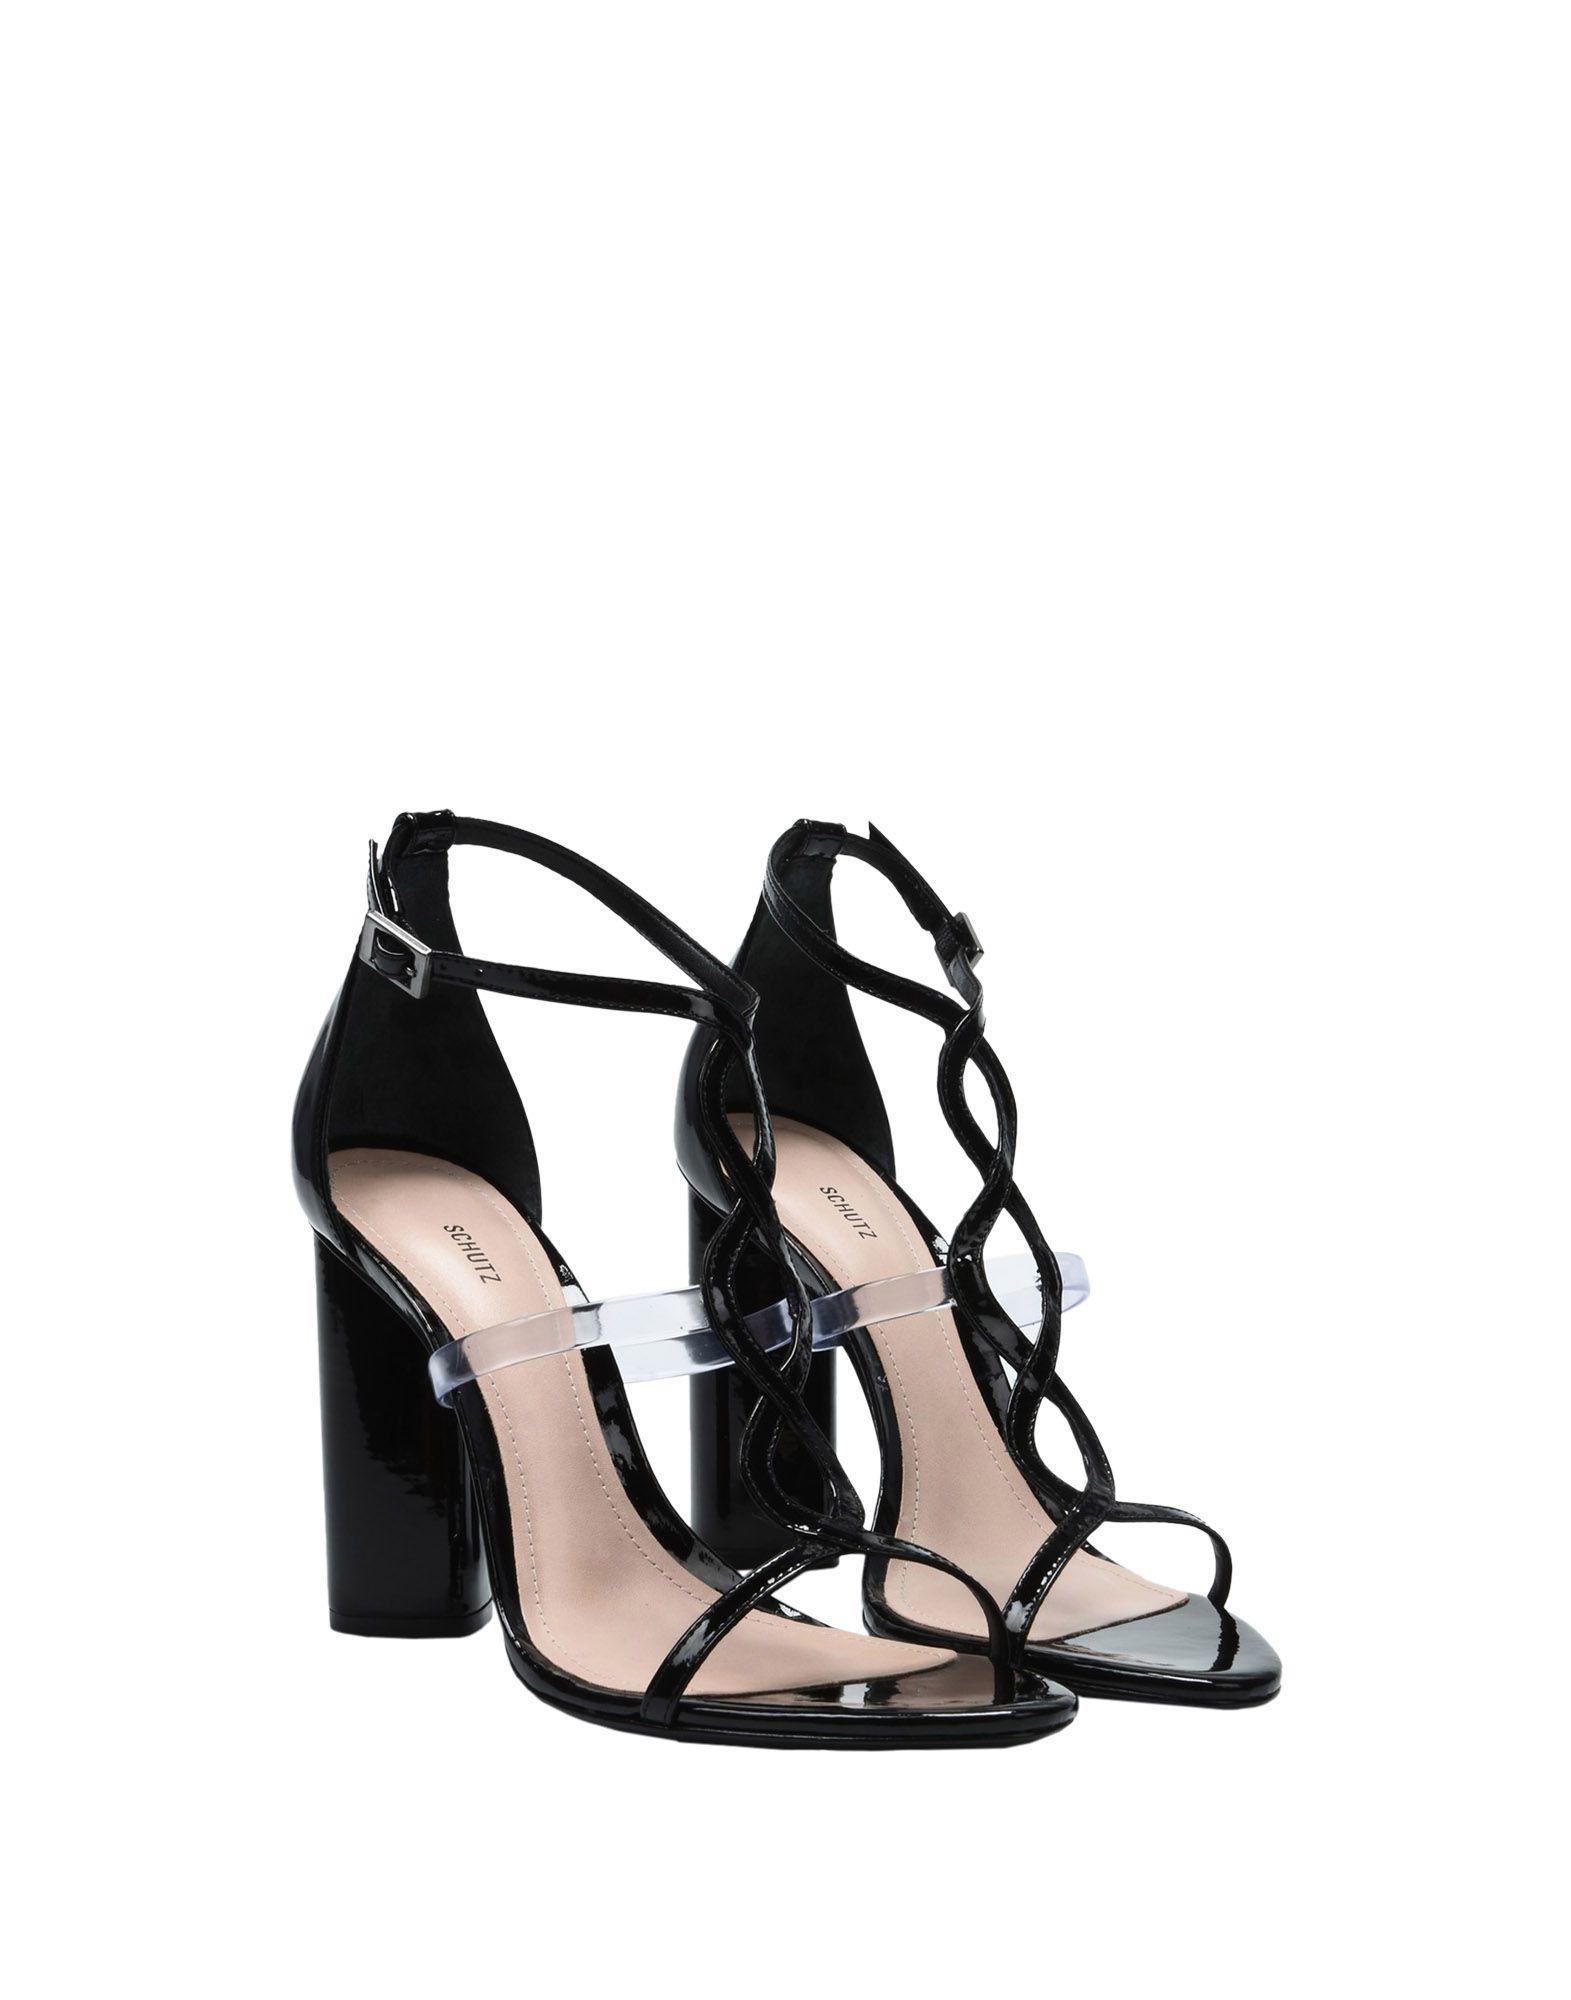 Schutz Sandalen Qualität Damen  11483077AW Gute Qualität Sandalen beliebte Schuhe 8ff9f9